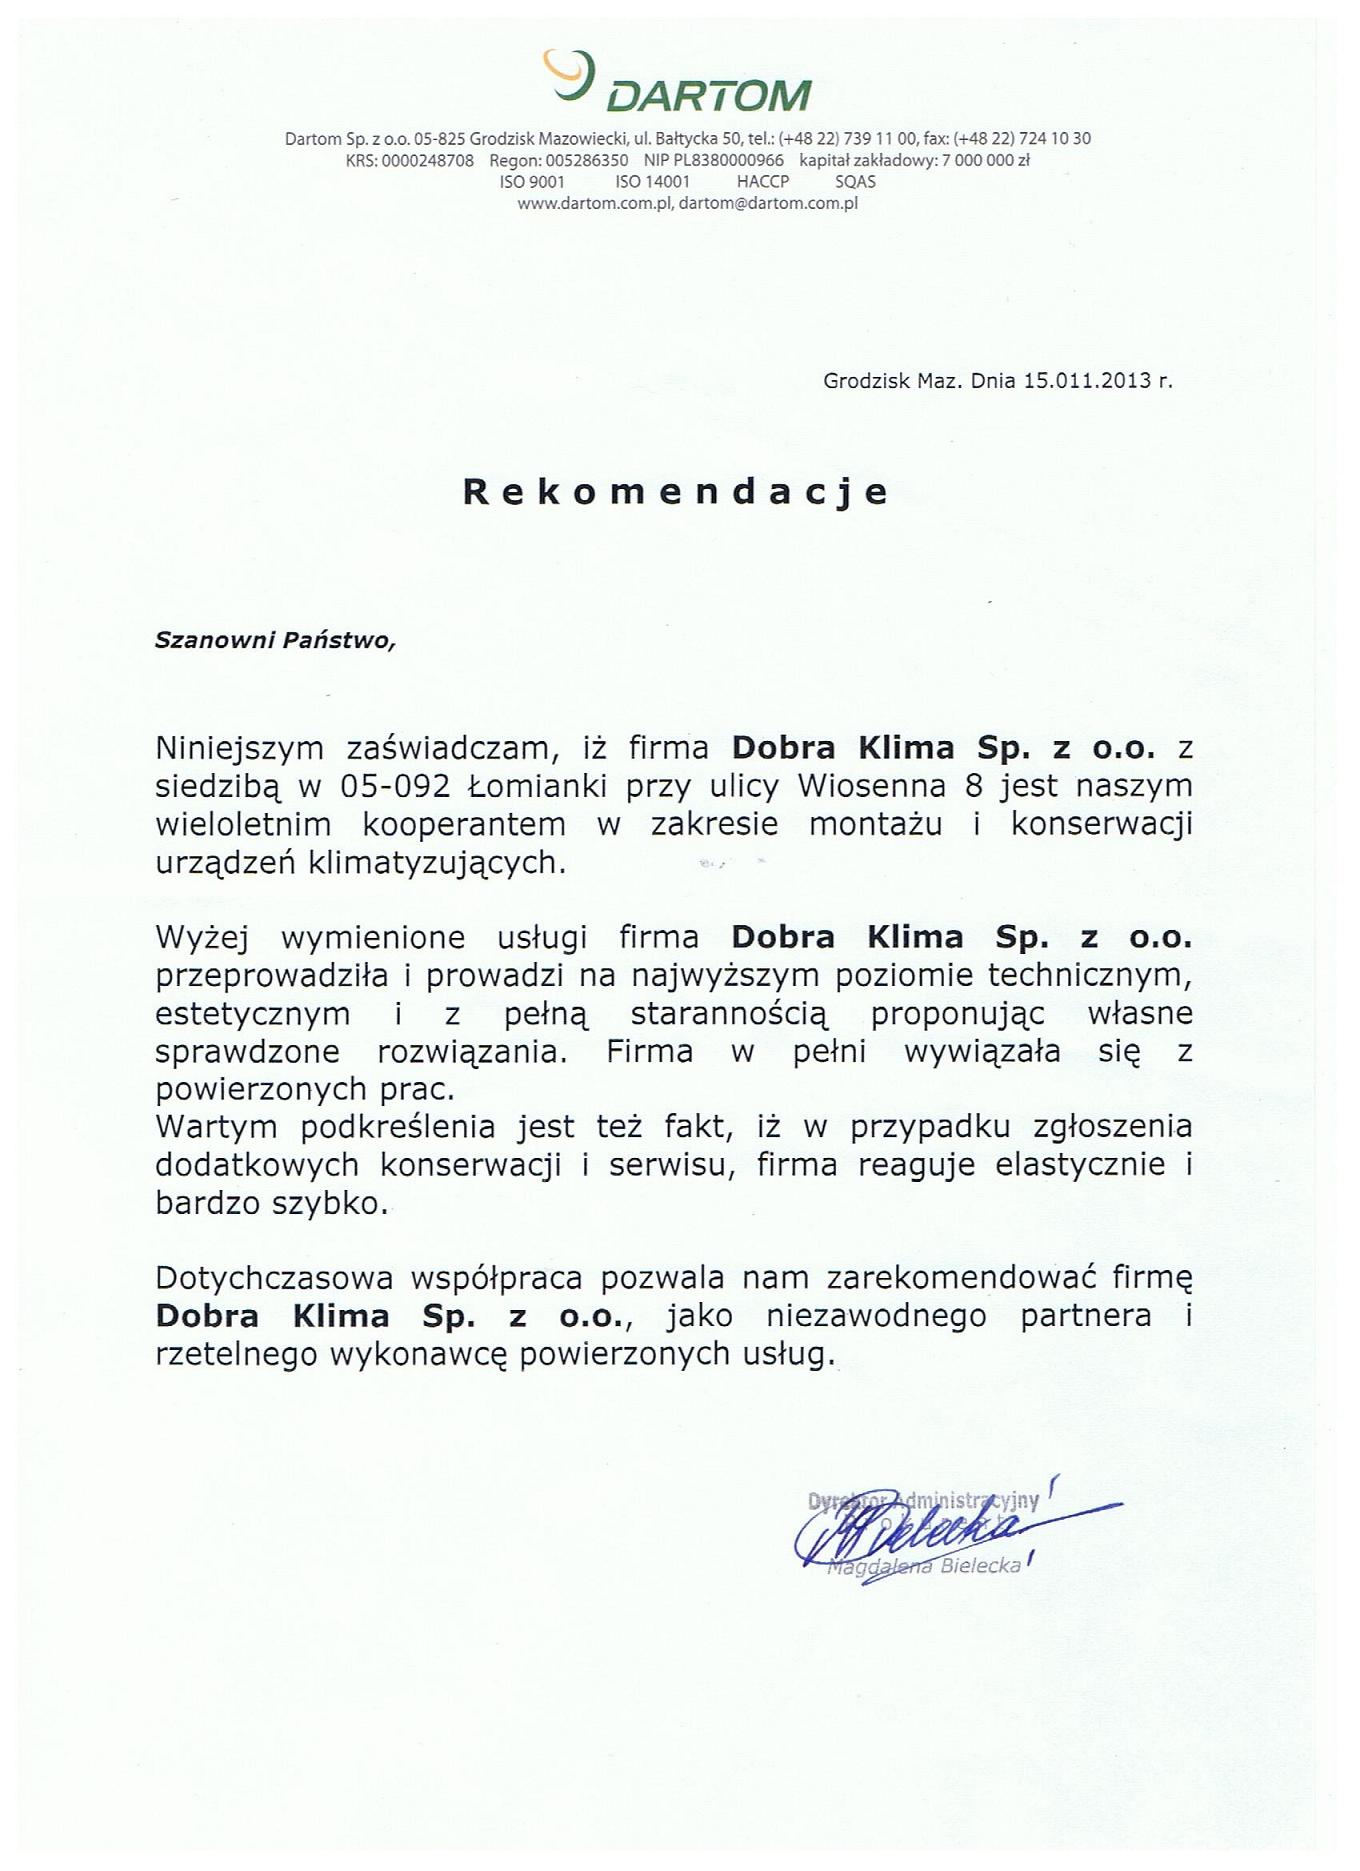 2013-referencje-dartom